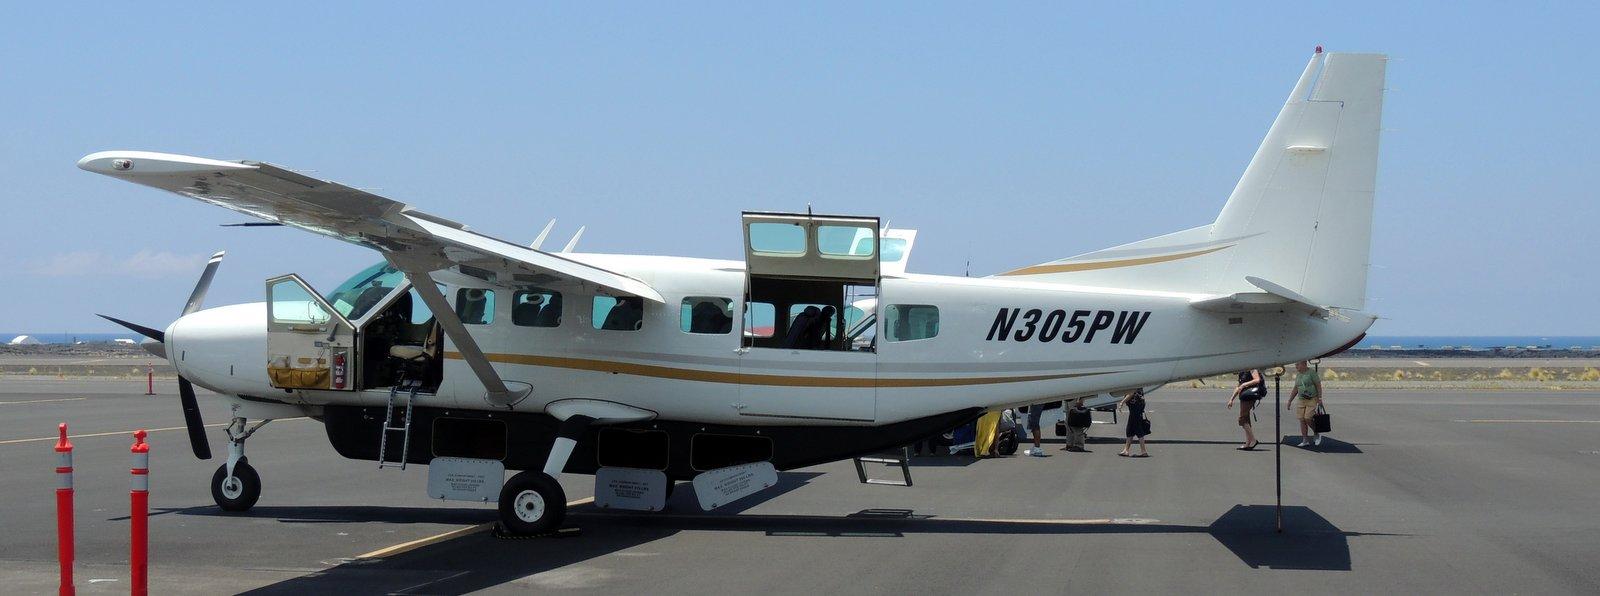 Pacific Wings Kona auf Hawaii nach Maui